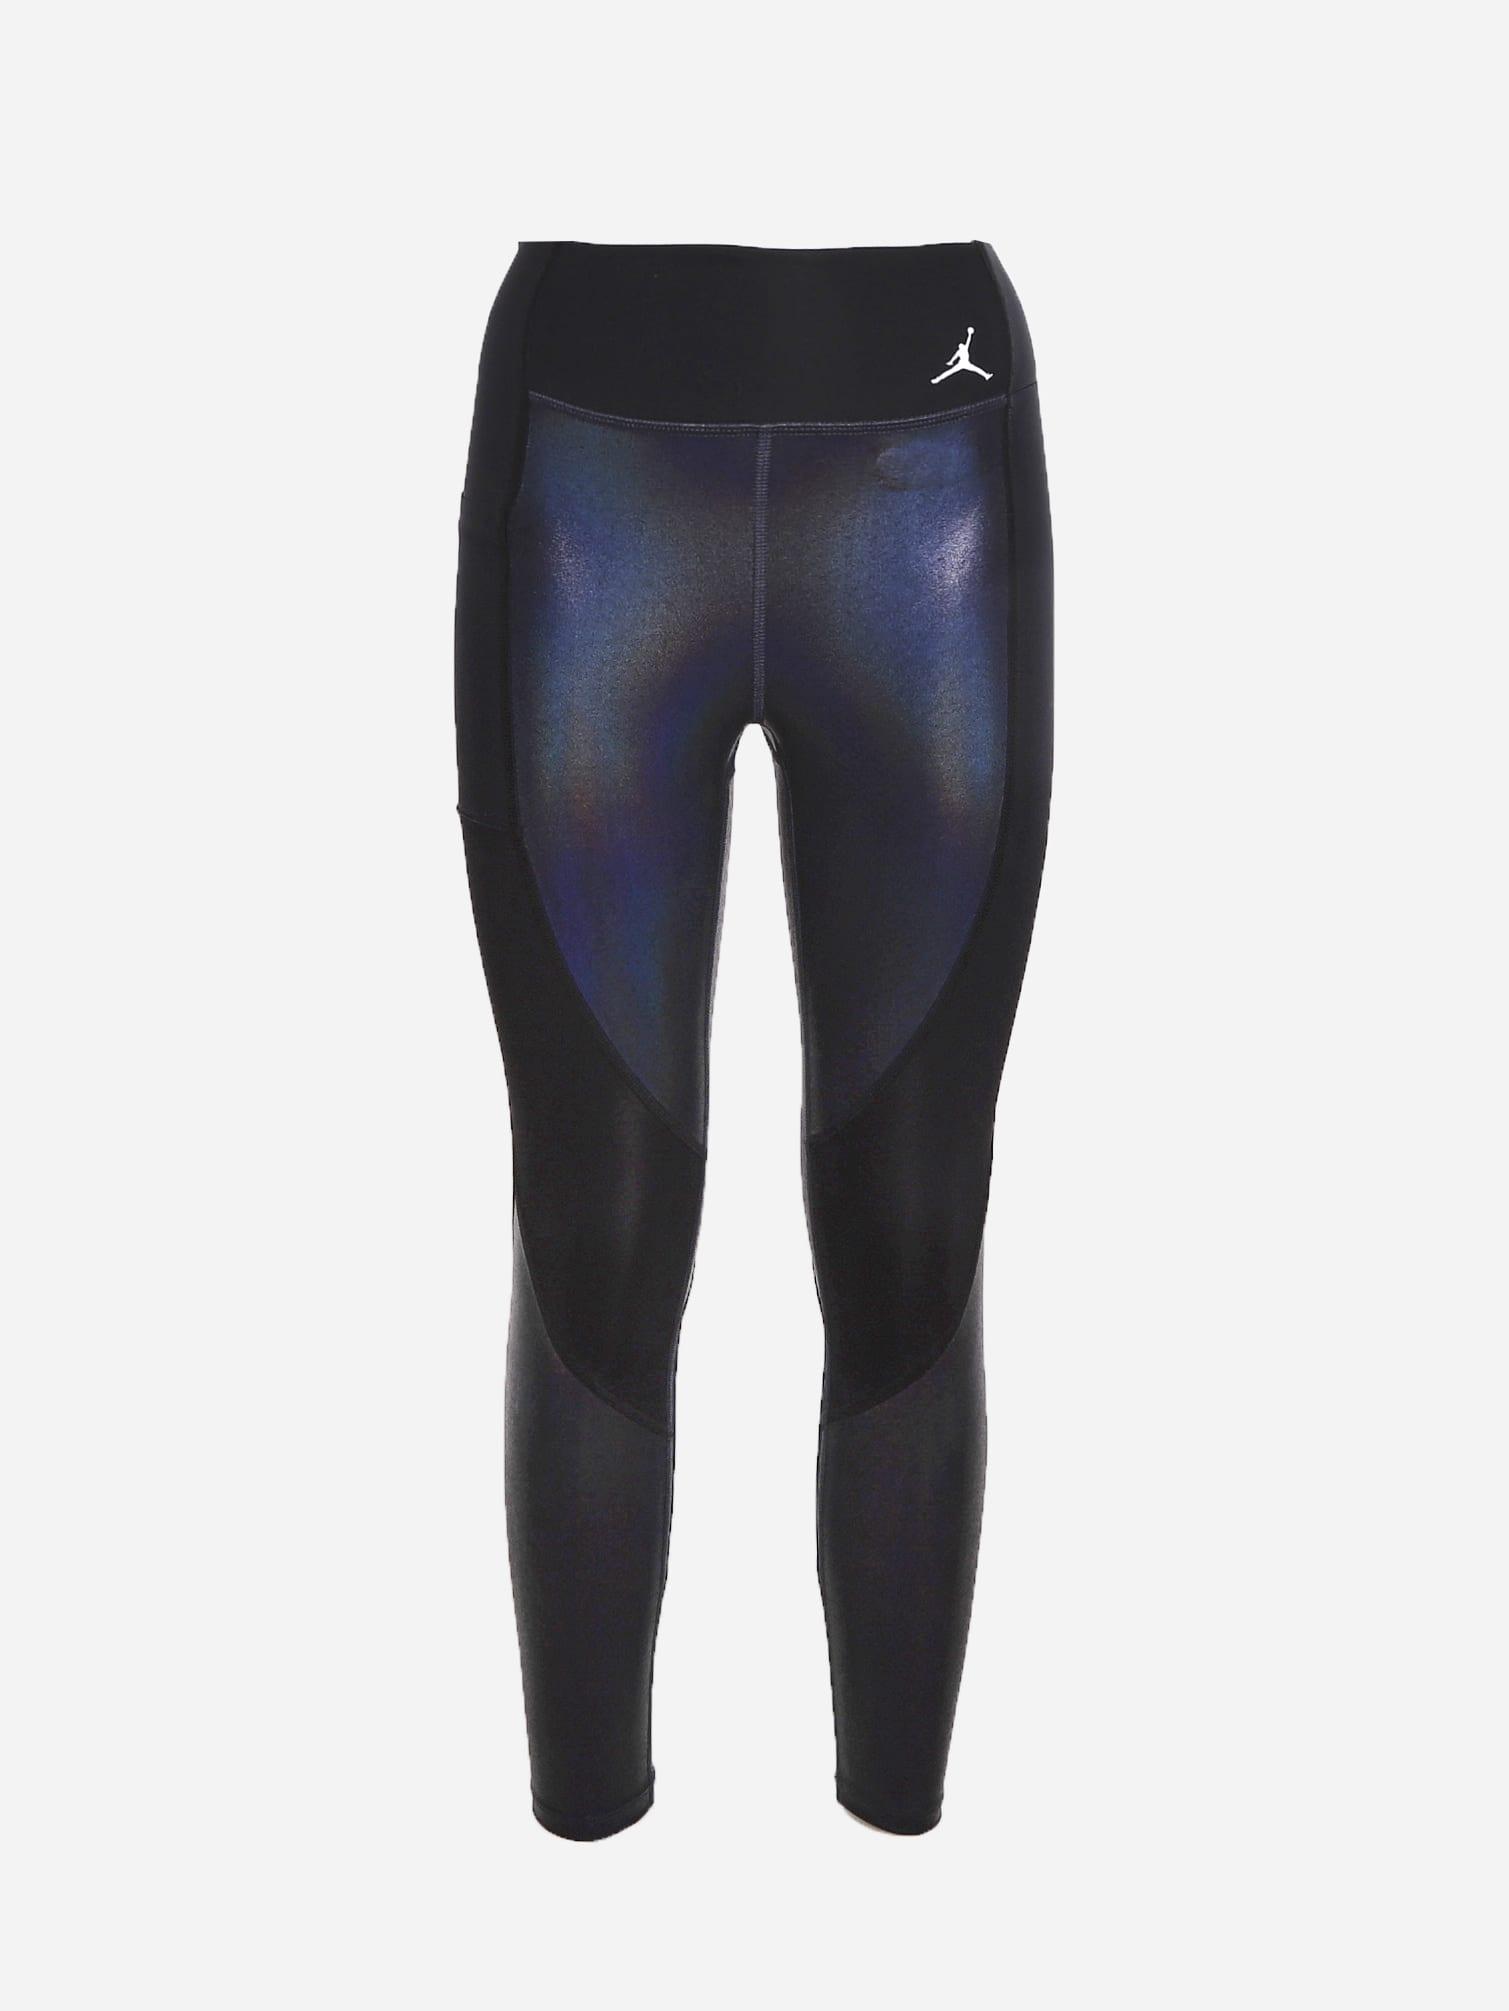 Jordan Jordan X Paris Saint-germain Leggings With Iridescent Print